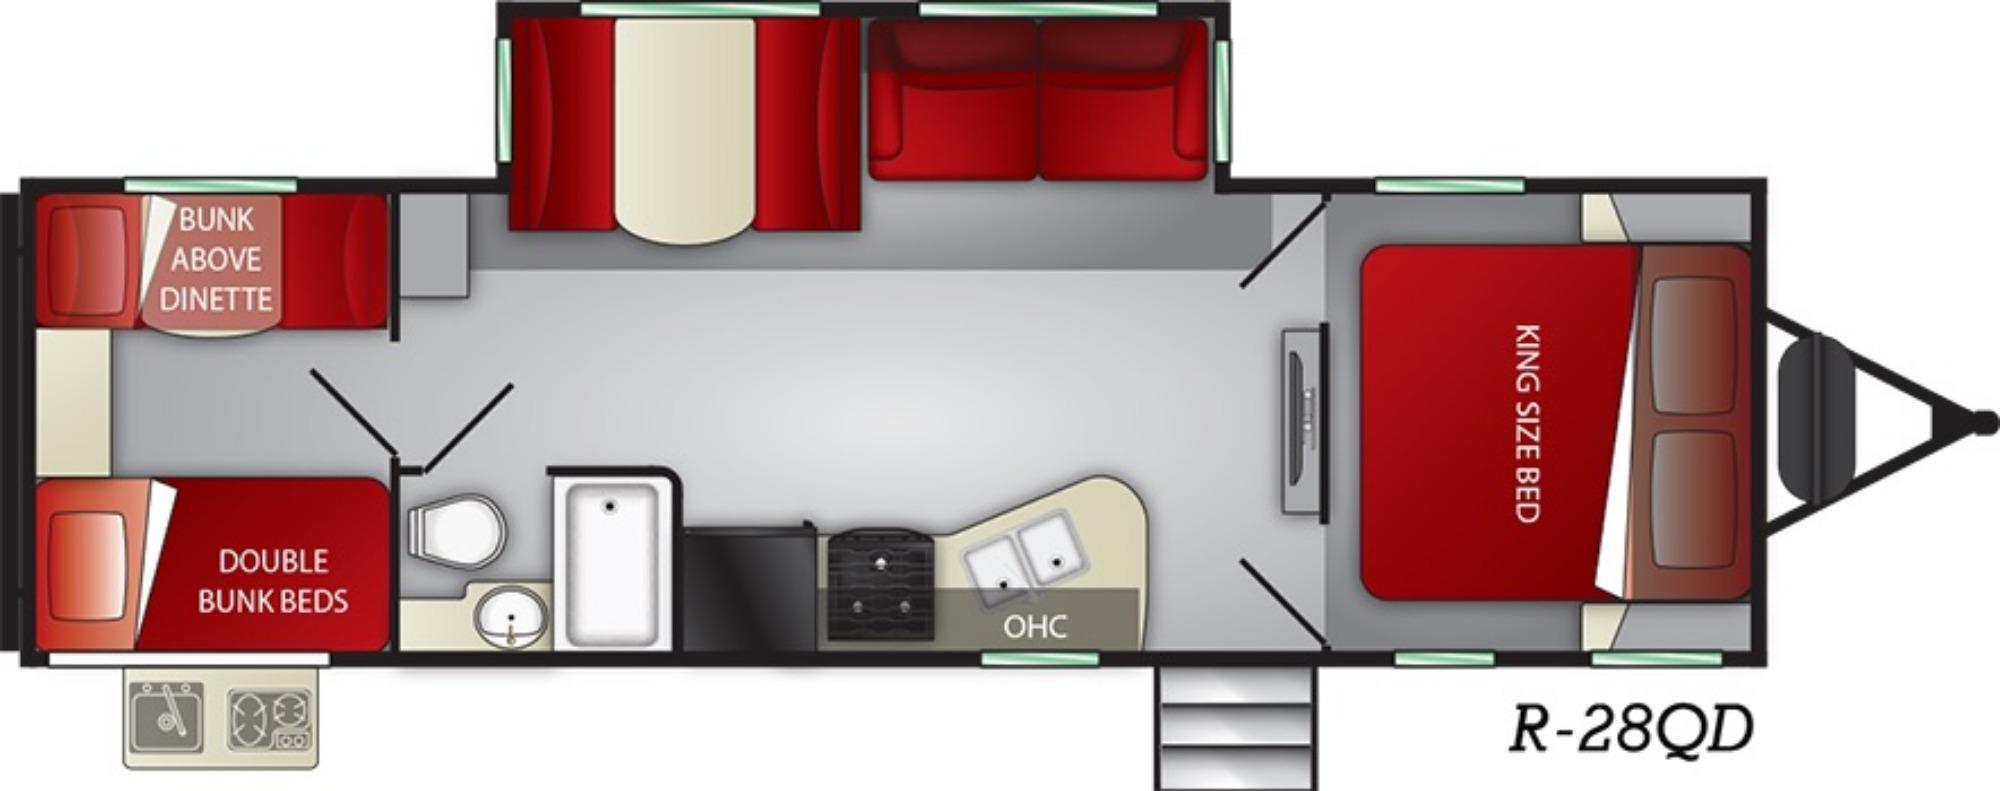 View Floor Plan for 2019 CRUISER RV RADIANCE 28QD